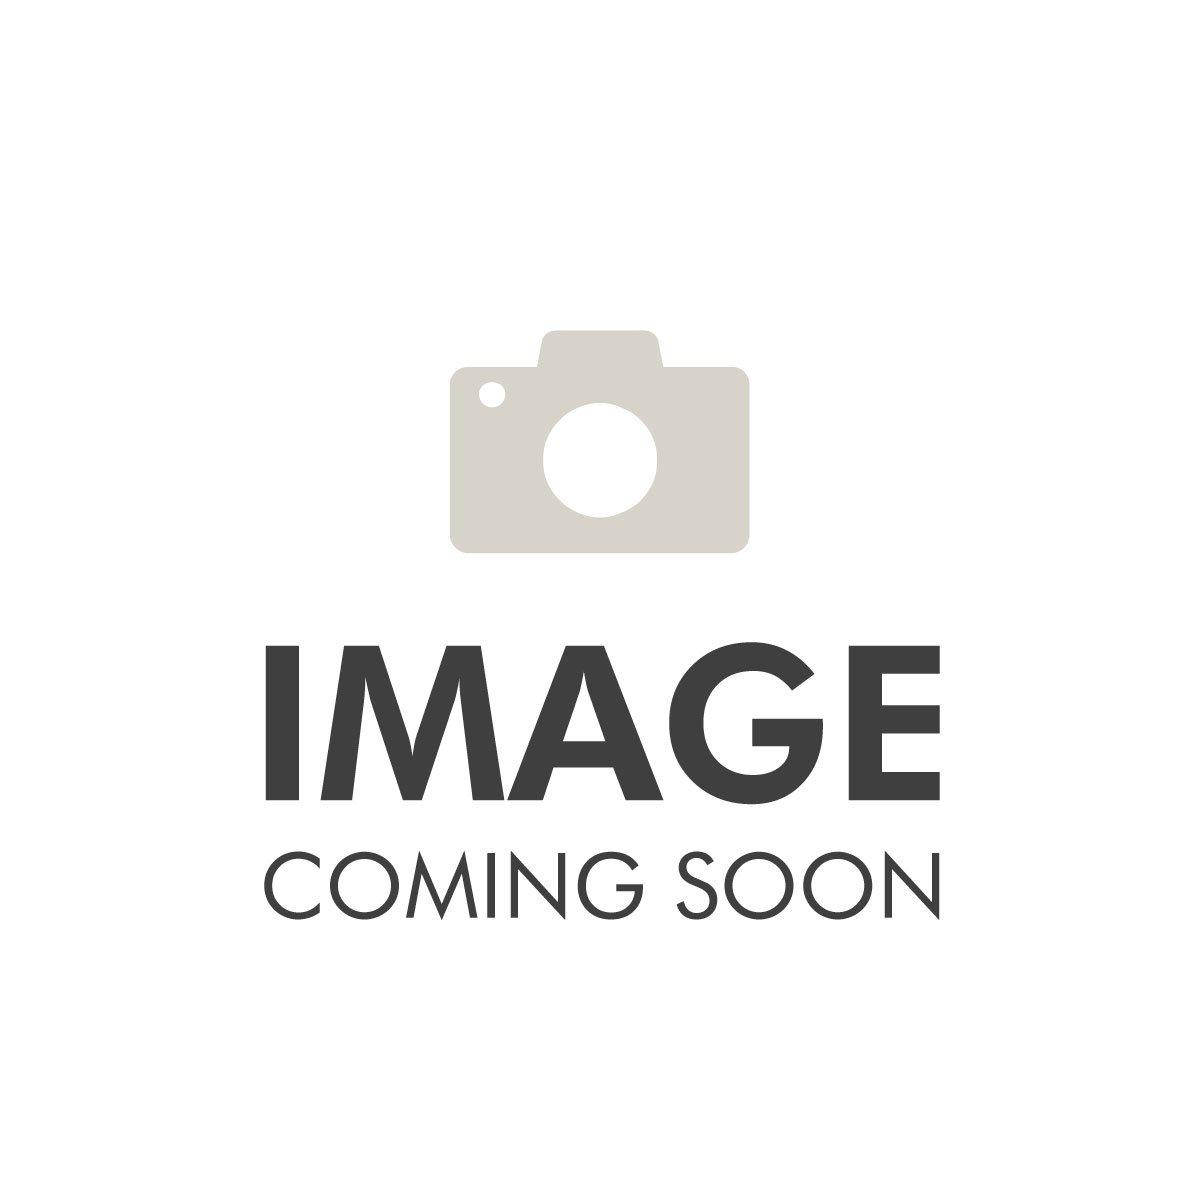 Uhlmann - Electric Foil/Sabre Pad - PVC